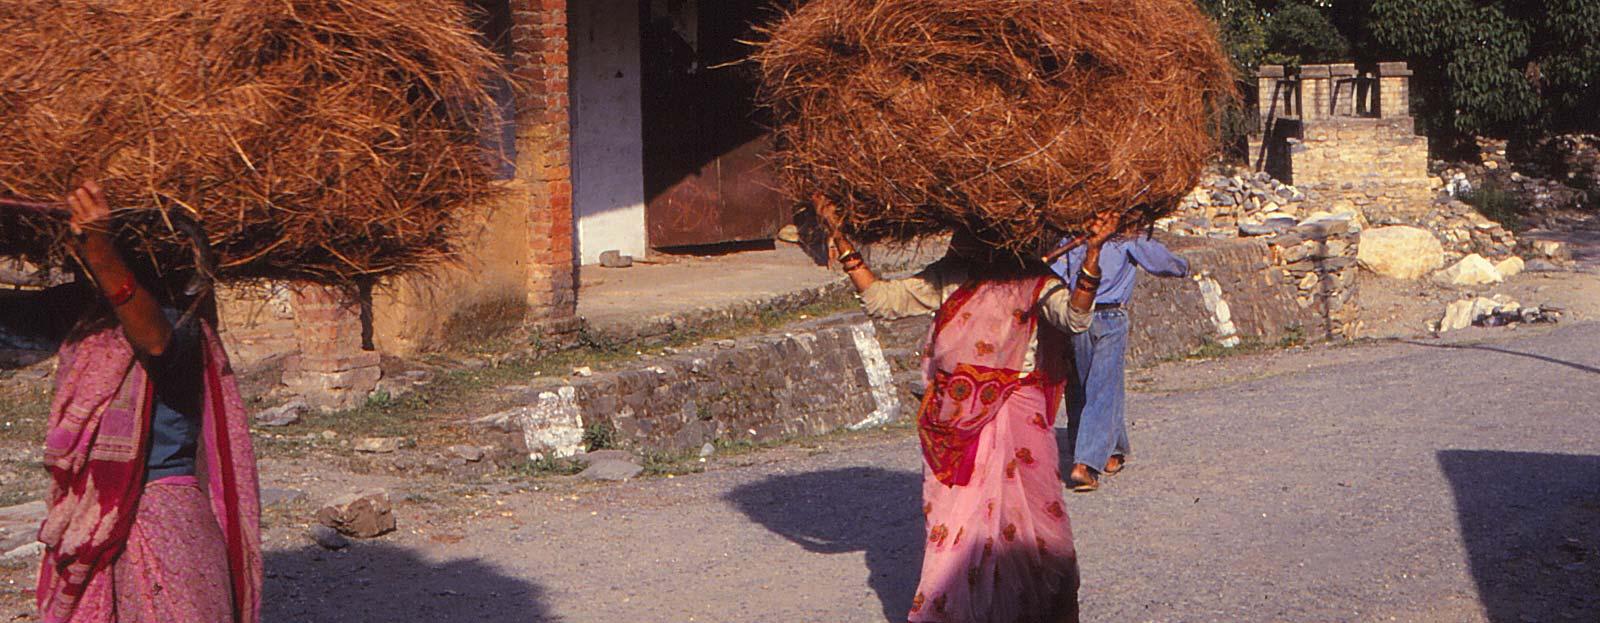 women-carrying-forest-clutter